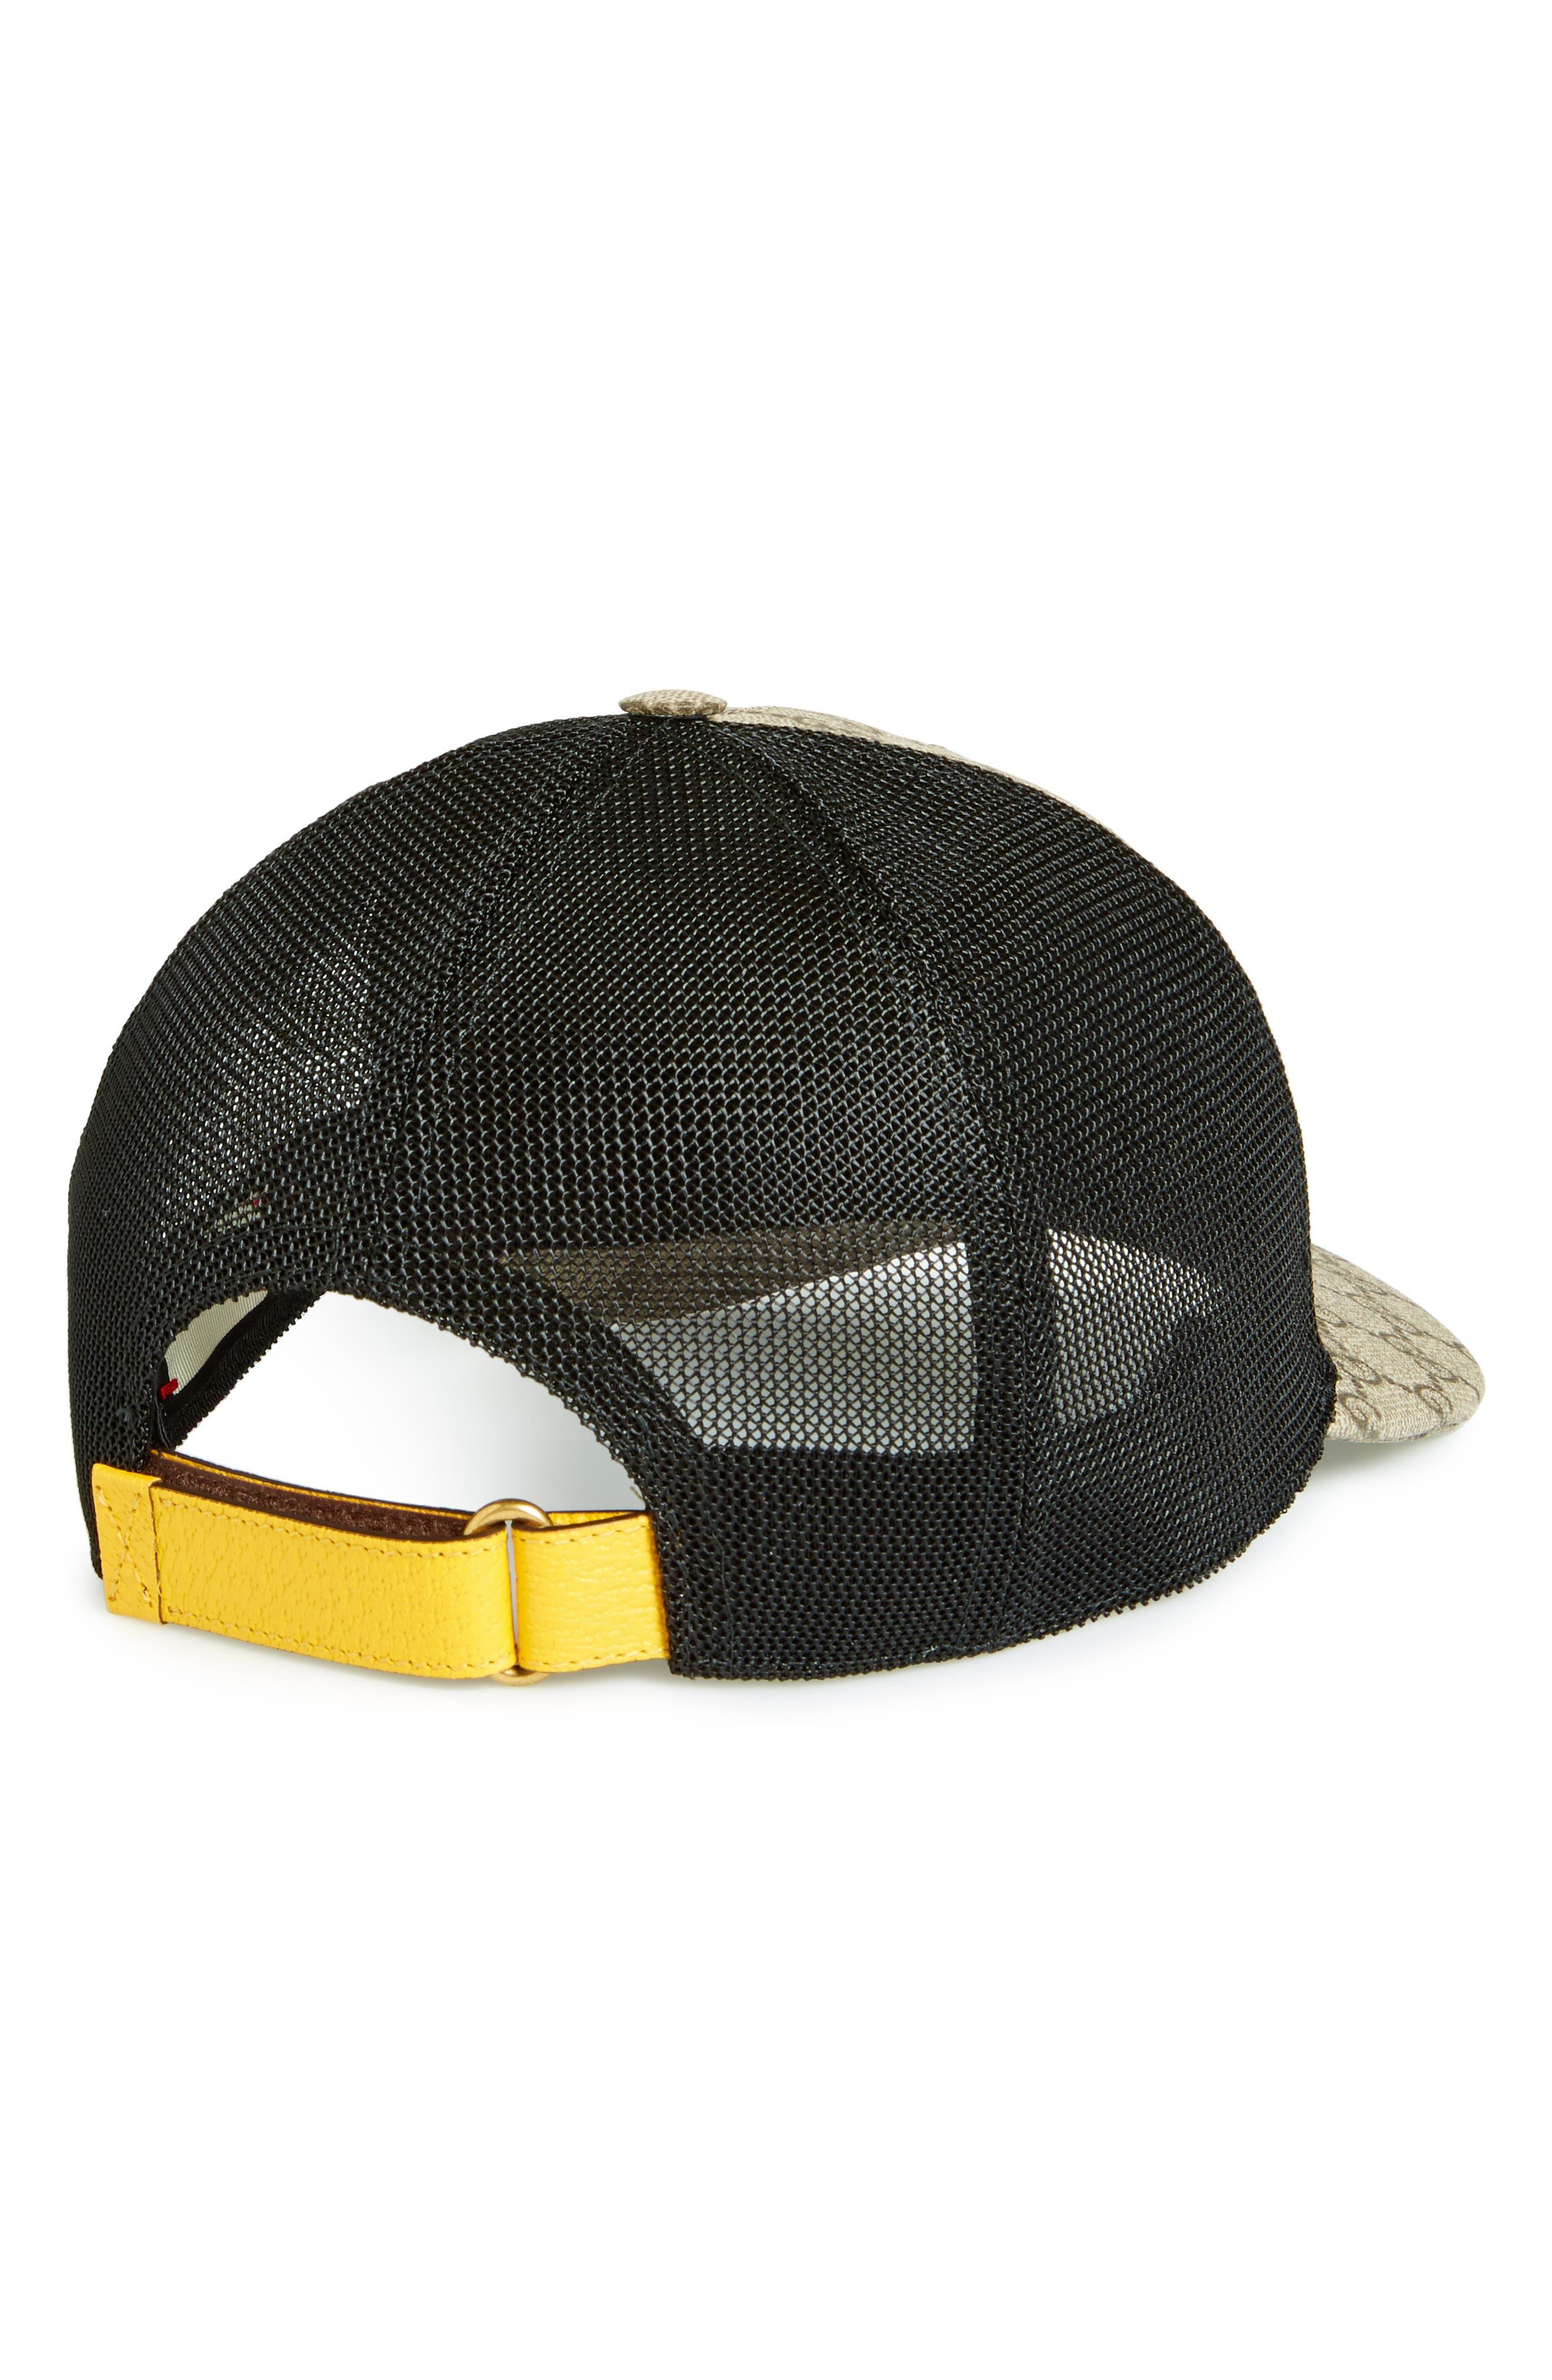 GG Supreme Patch Trucker Hat,                             Alternate thumbnail 2, color,                             Dark Brown